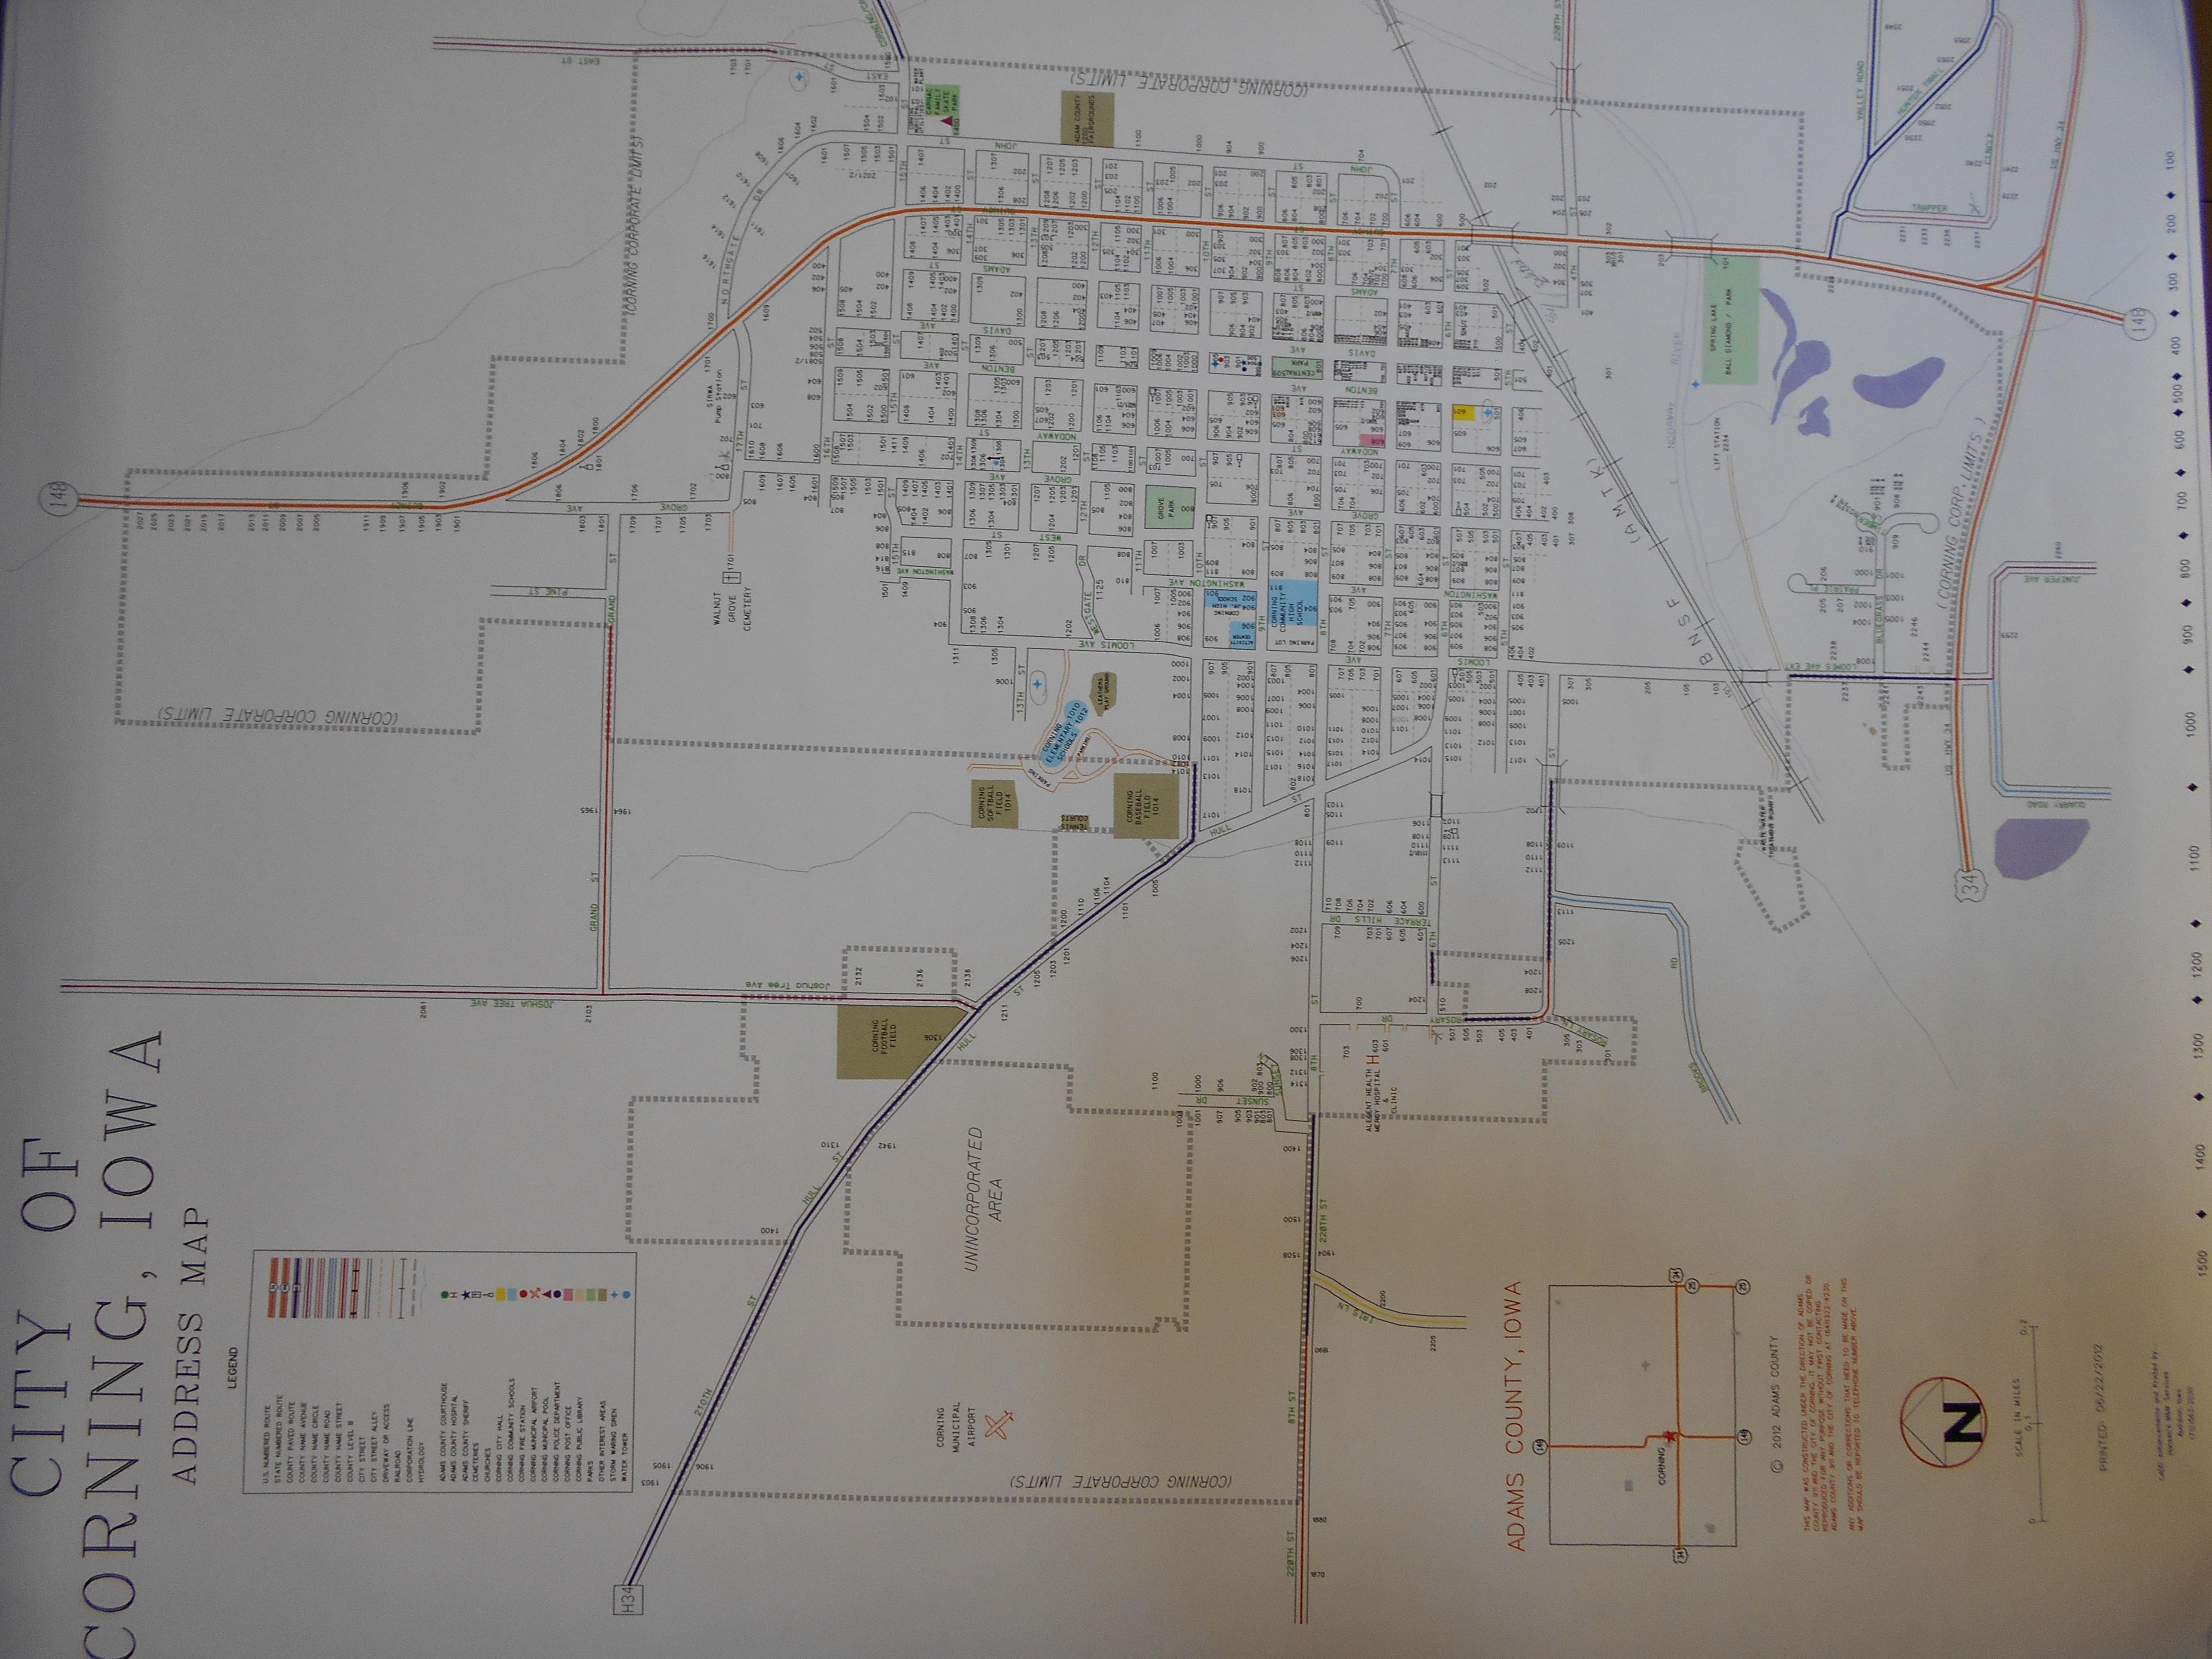 City of Corning Maps   City of Corning, Iowa